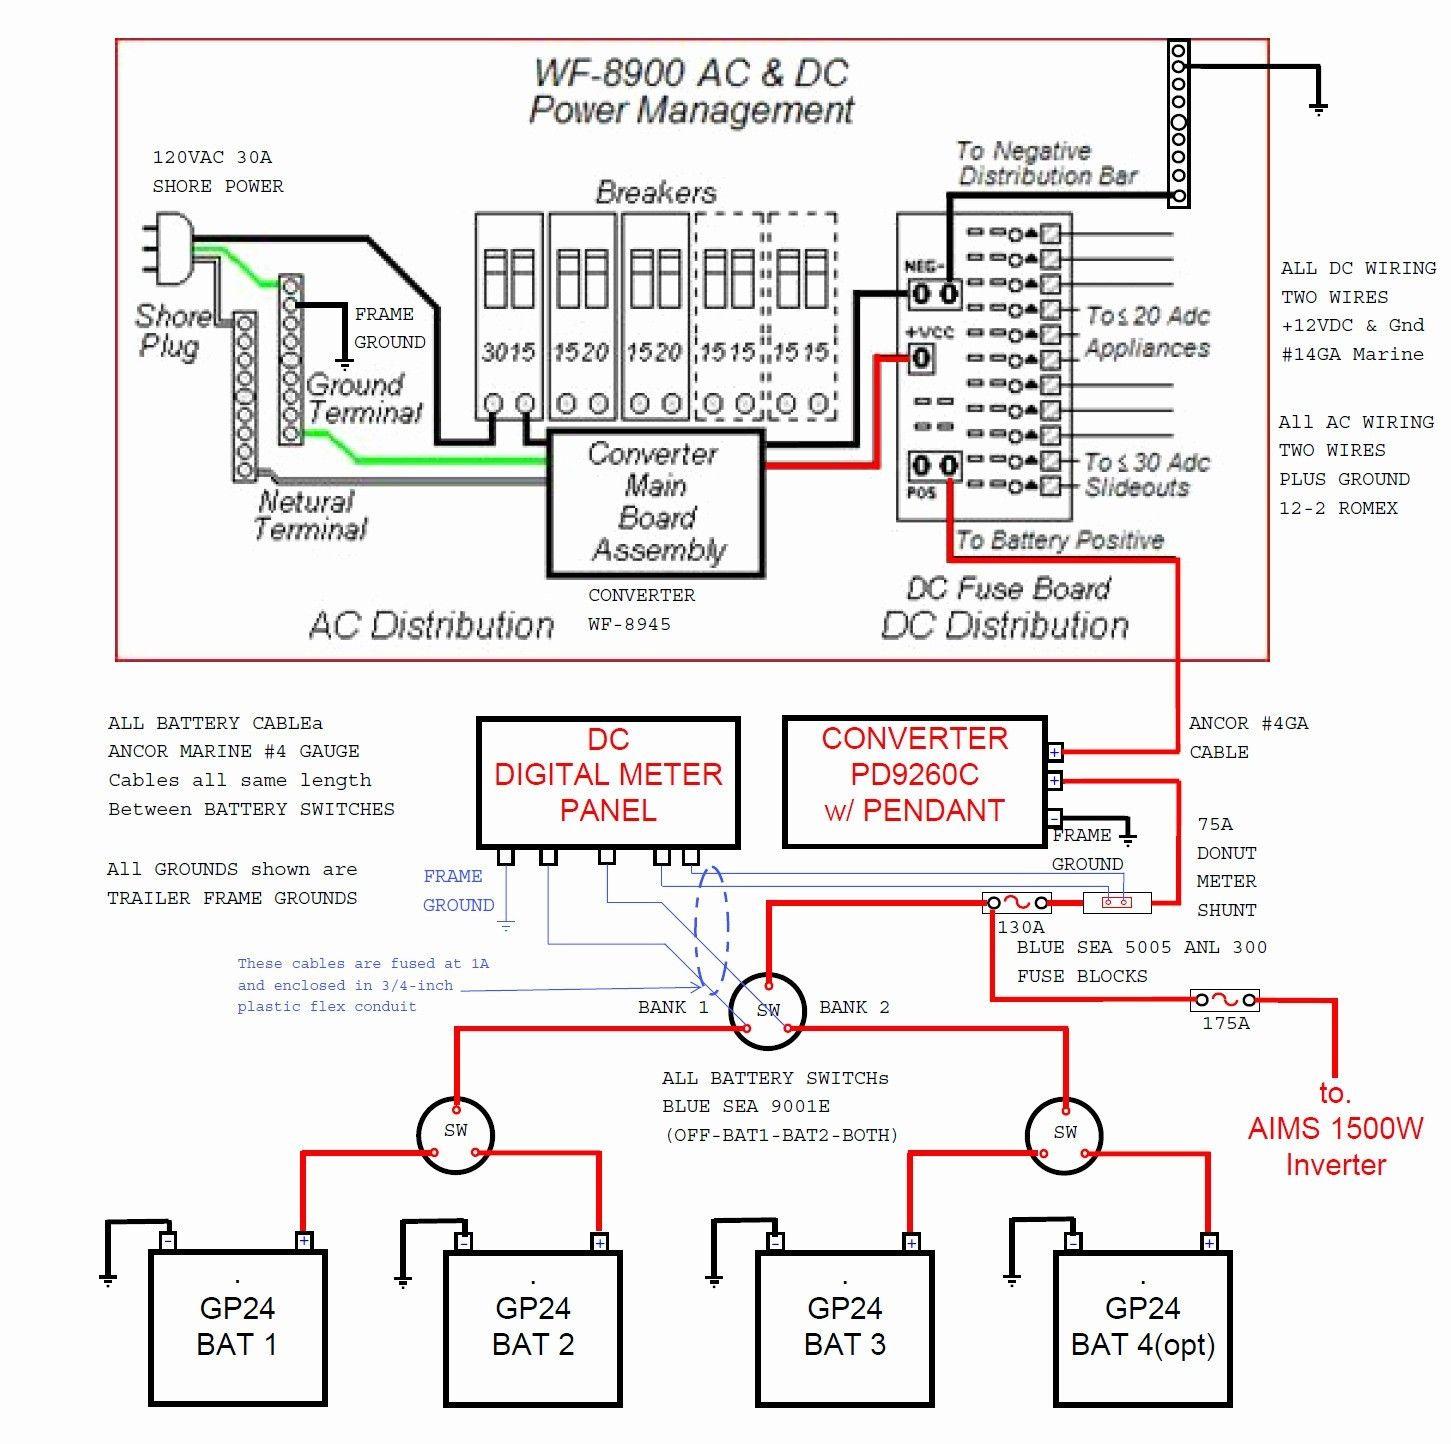 Tremendous 50 Rv Wiring Schematic Basic Electronics Wiring Diagram Wiring Cloud Grayisramohammedshrineorg